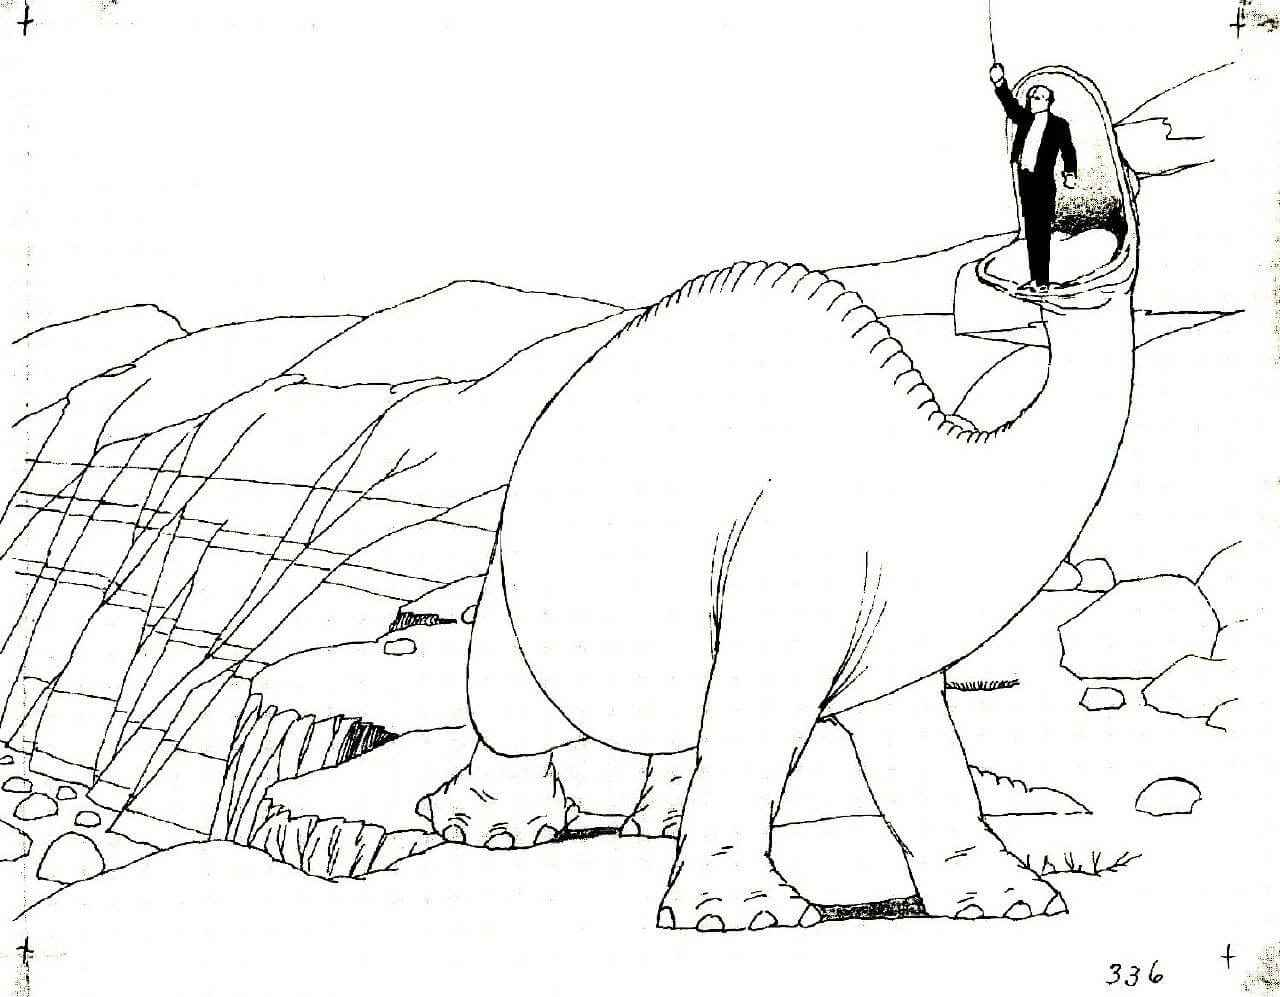 Gertie-the-Dinosaur-1914.jpg